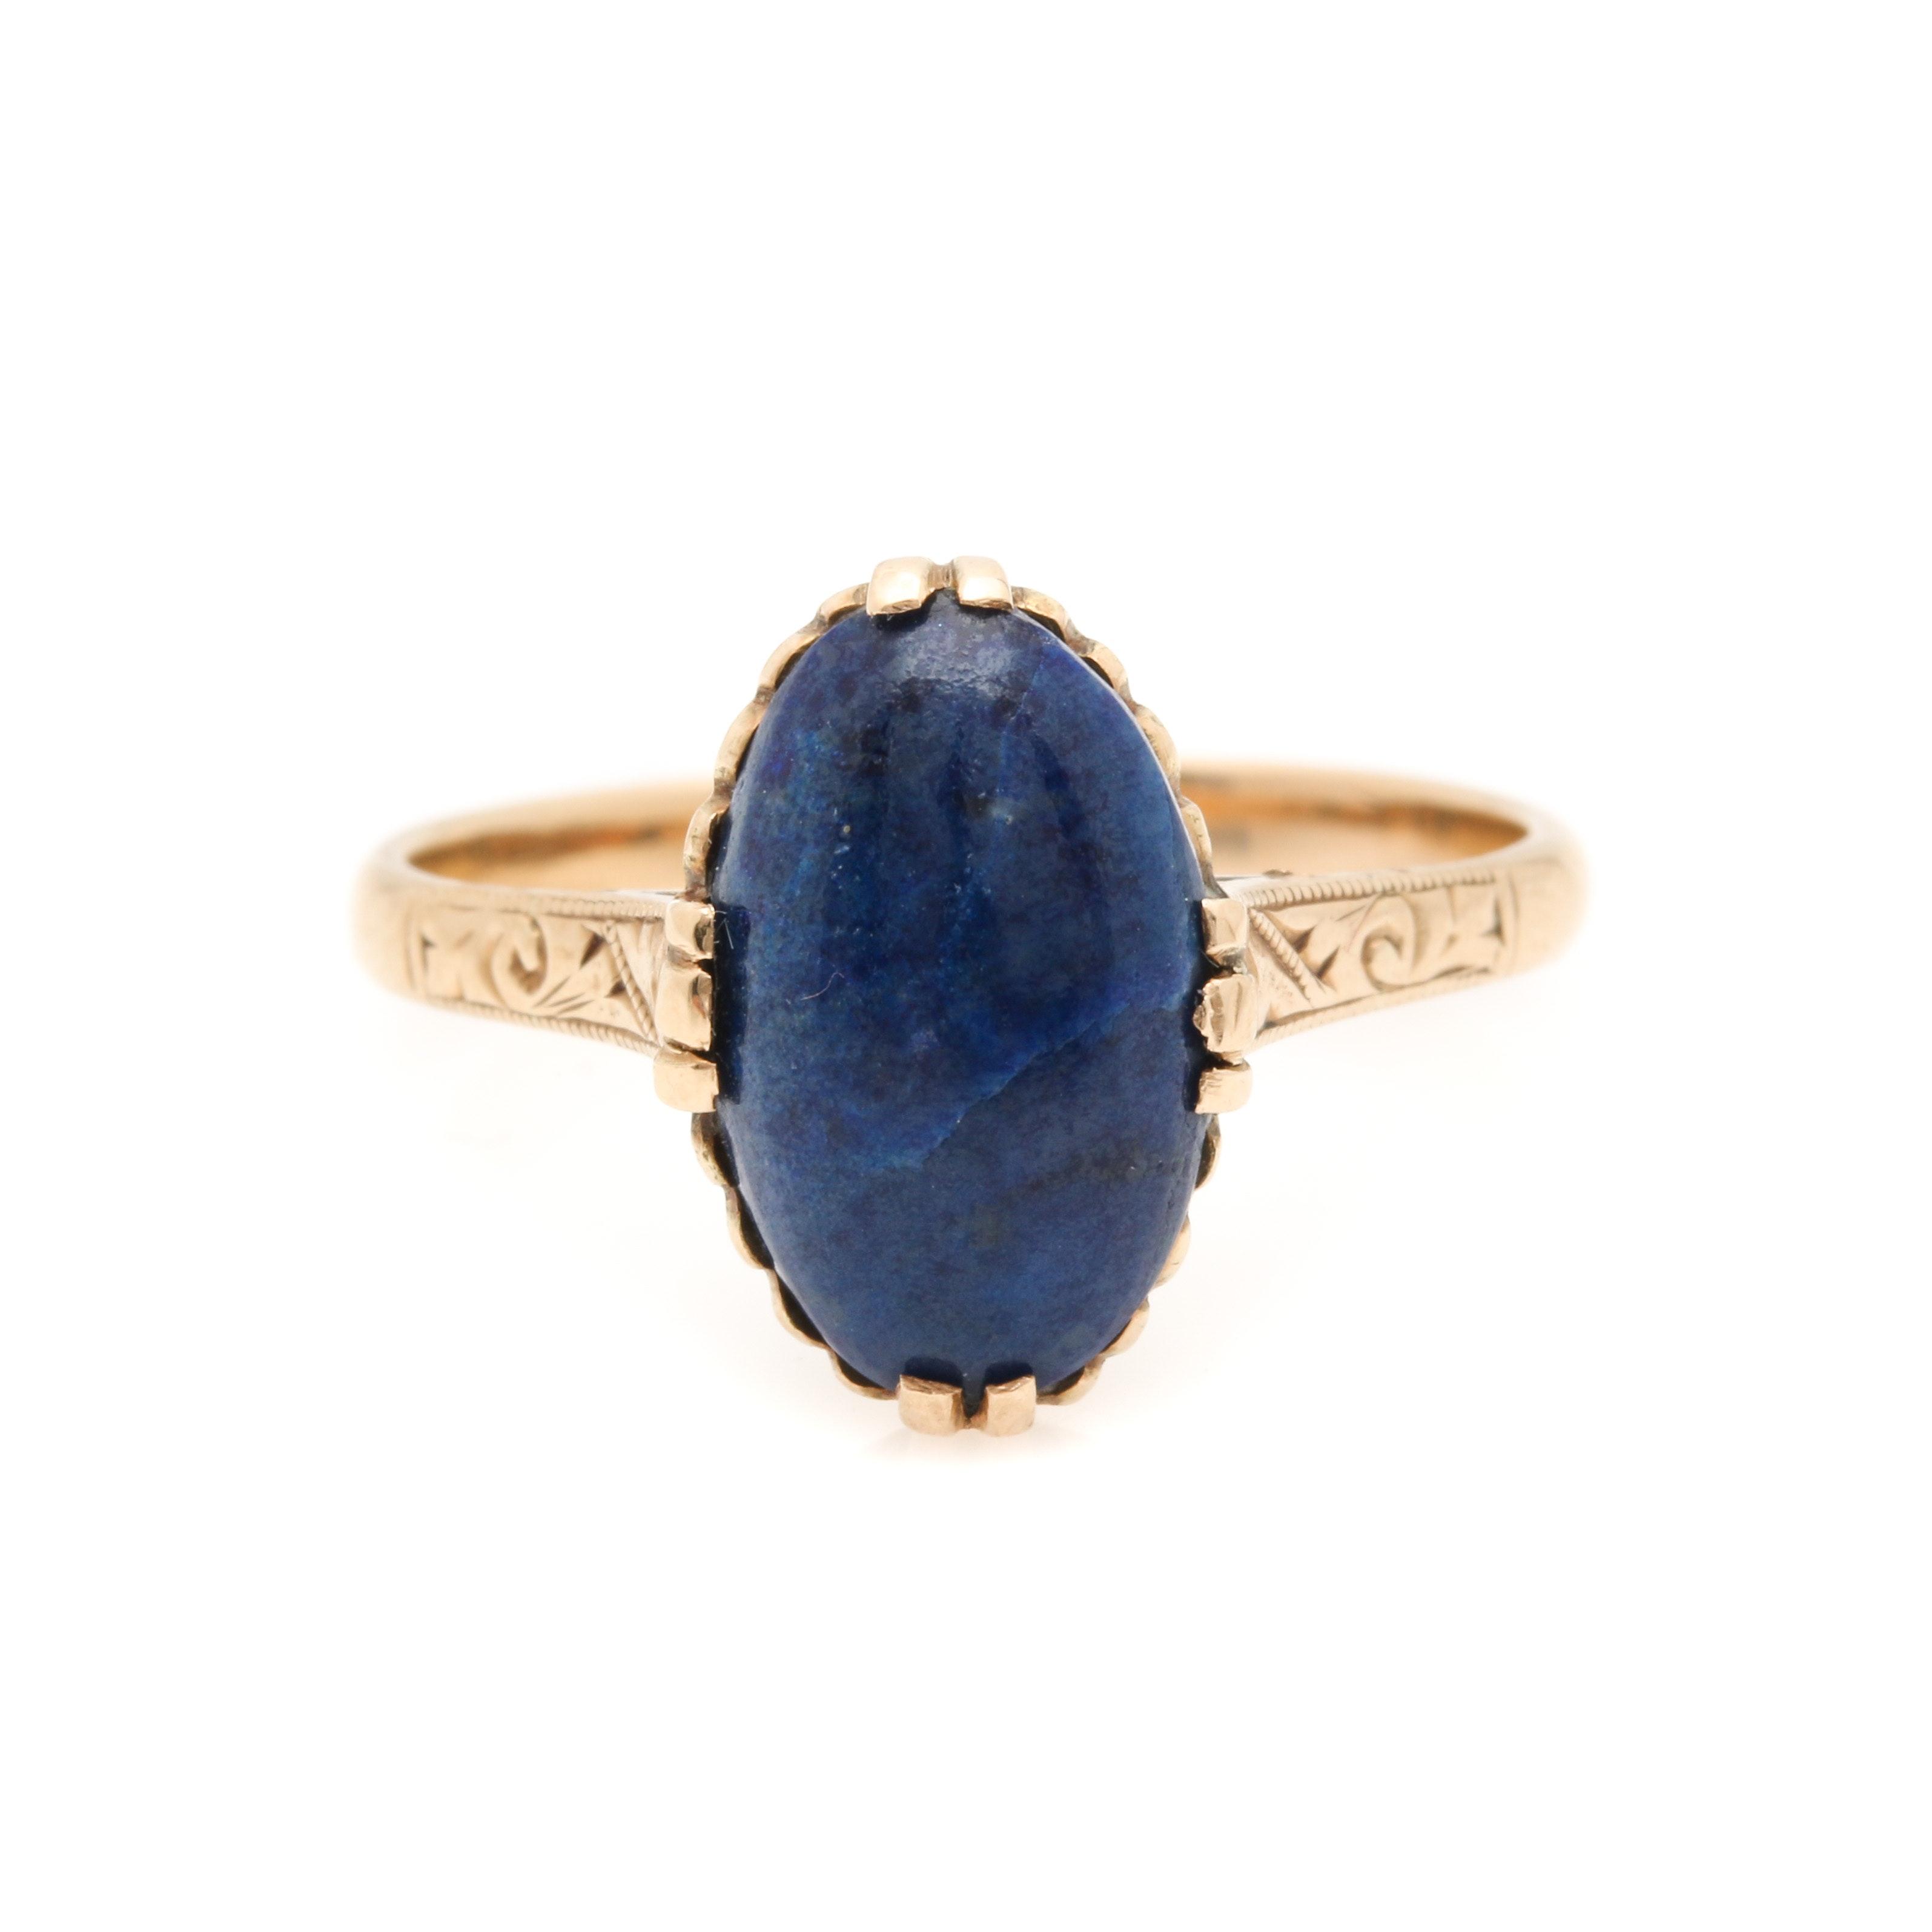 Victorian 14K Yellow Gold Lapis Lazuli Ring